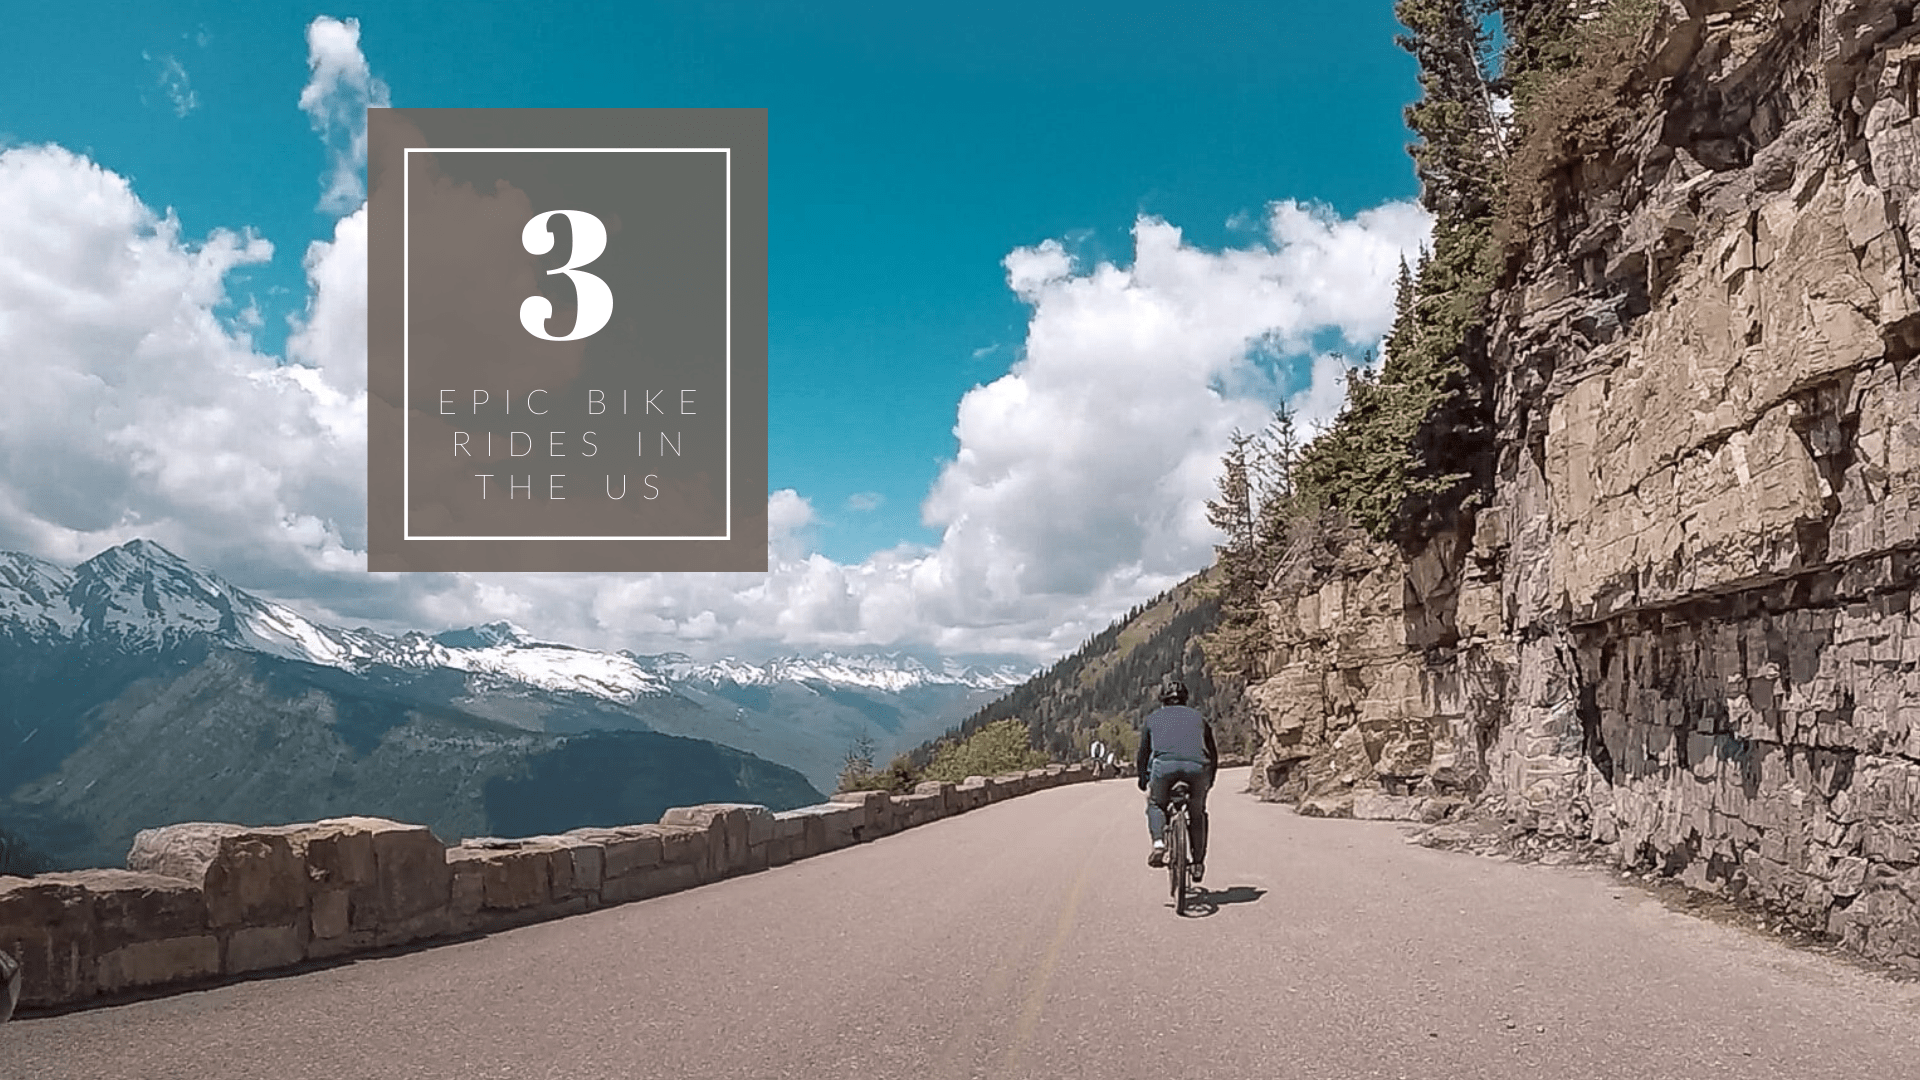 3 Epic Bike Rides